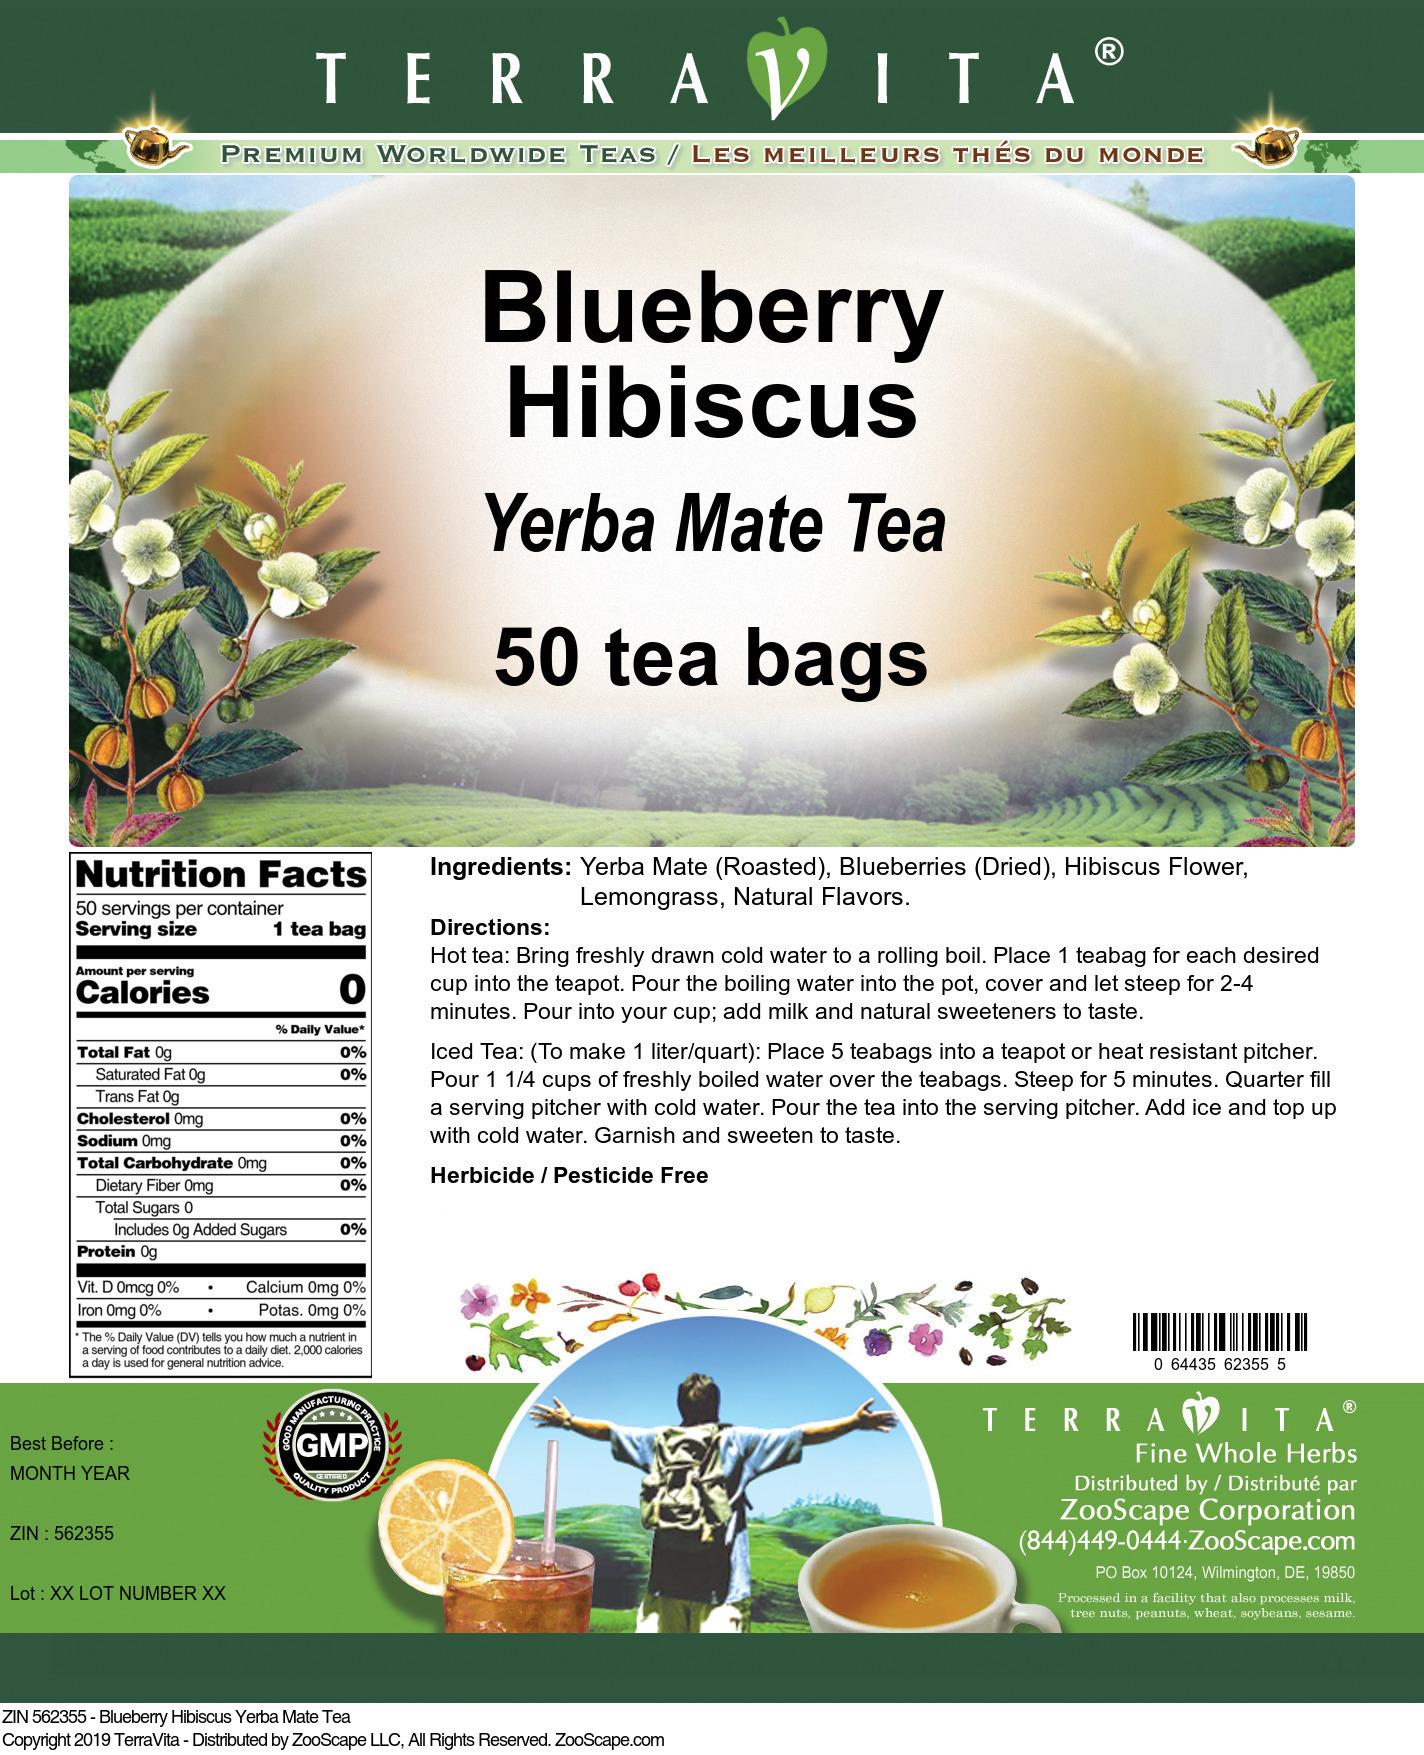 Blueberry Hibiscus Yerba Mate Tea